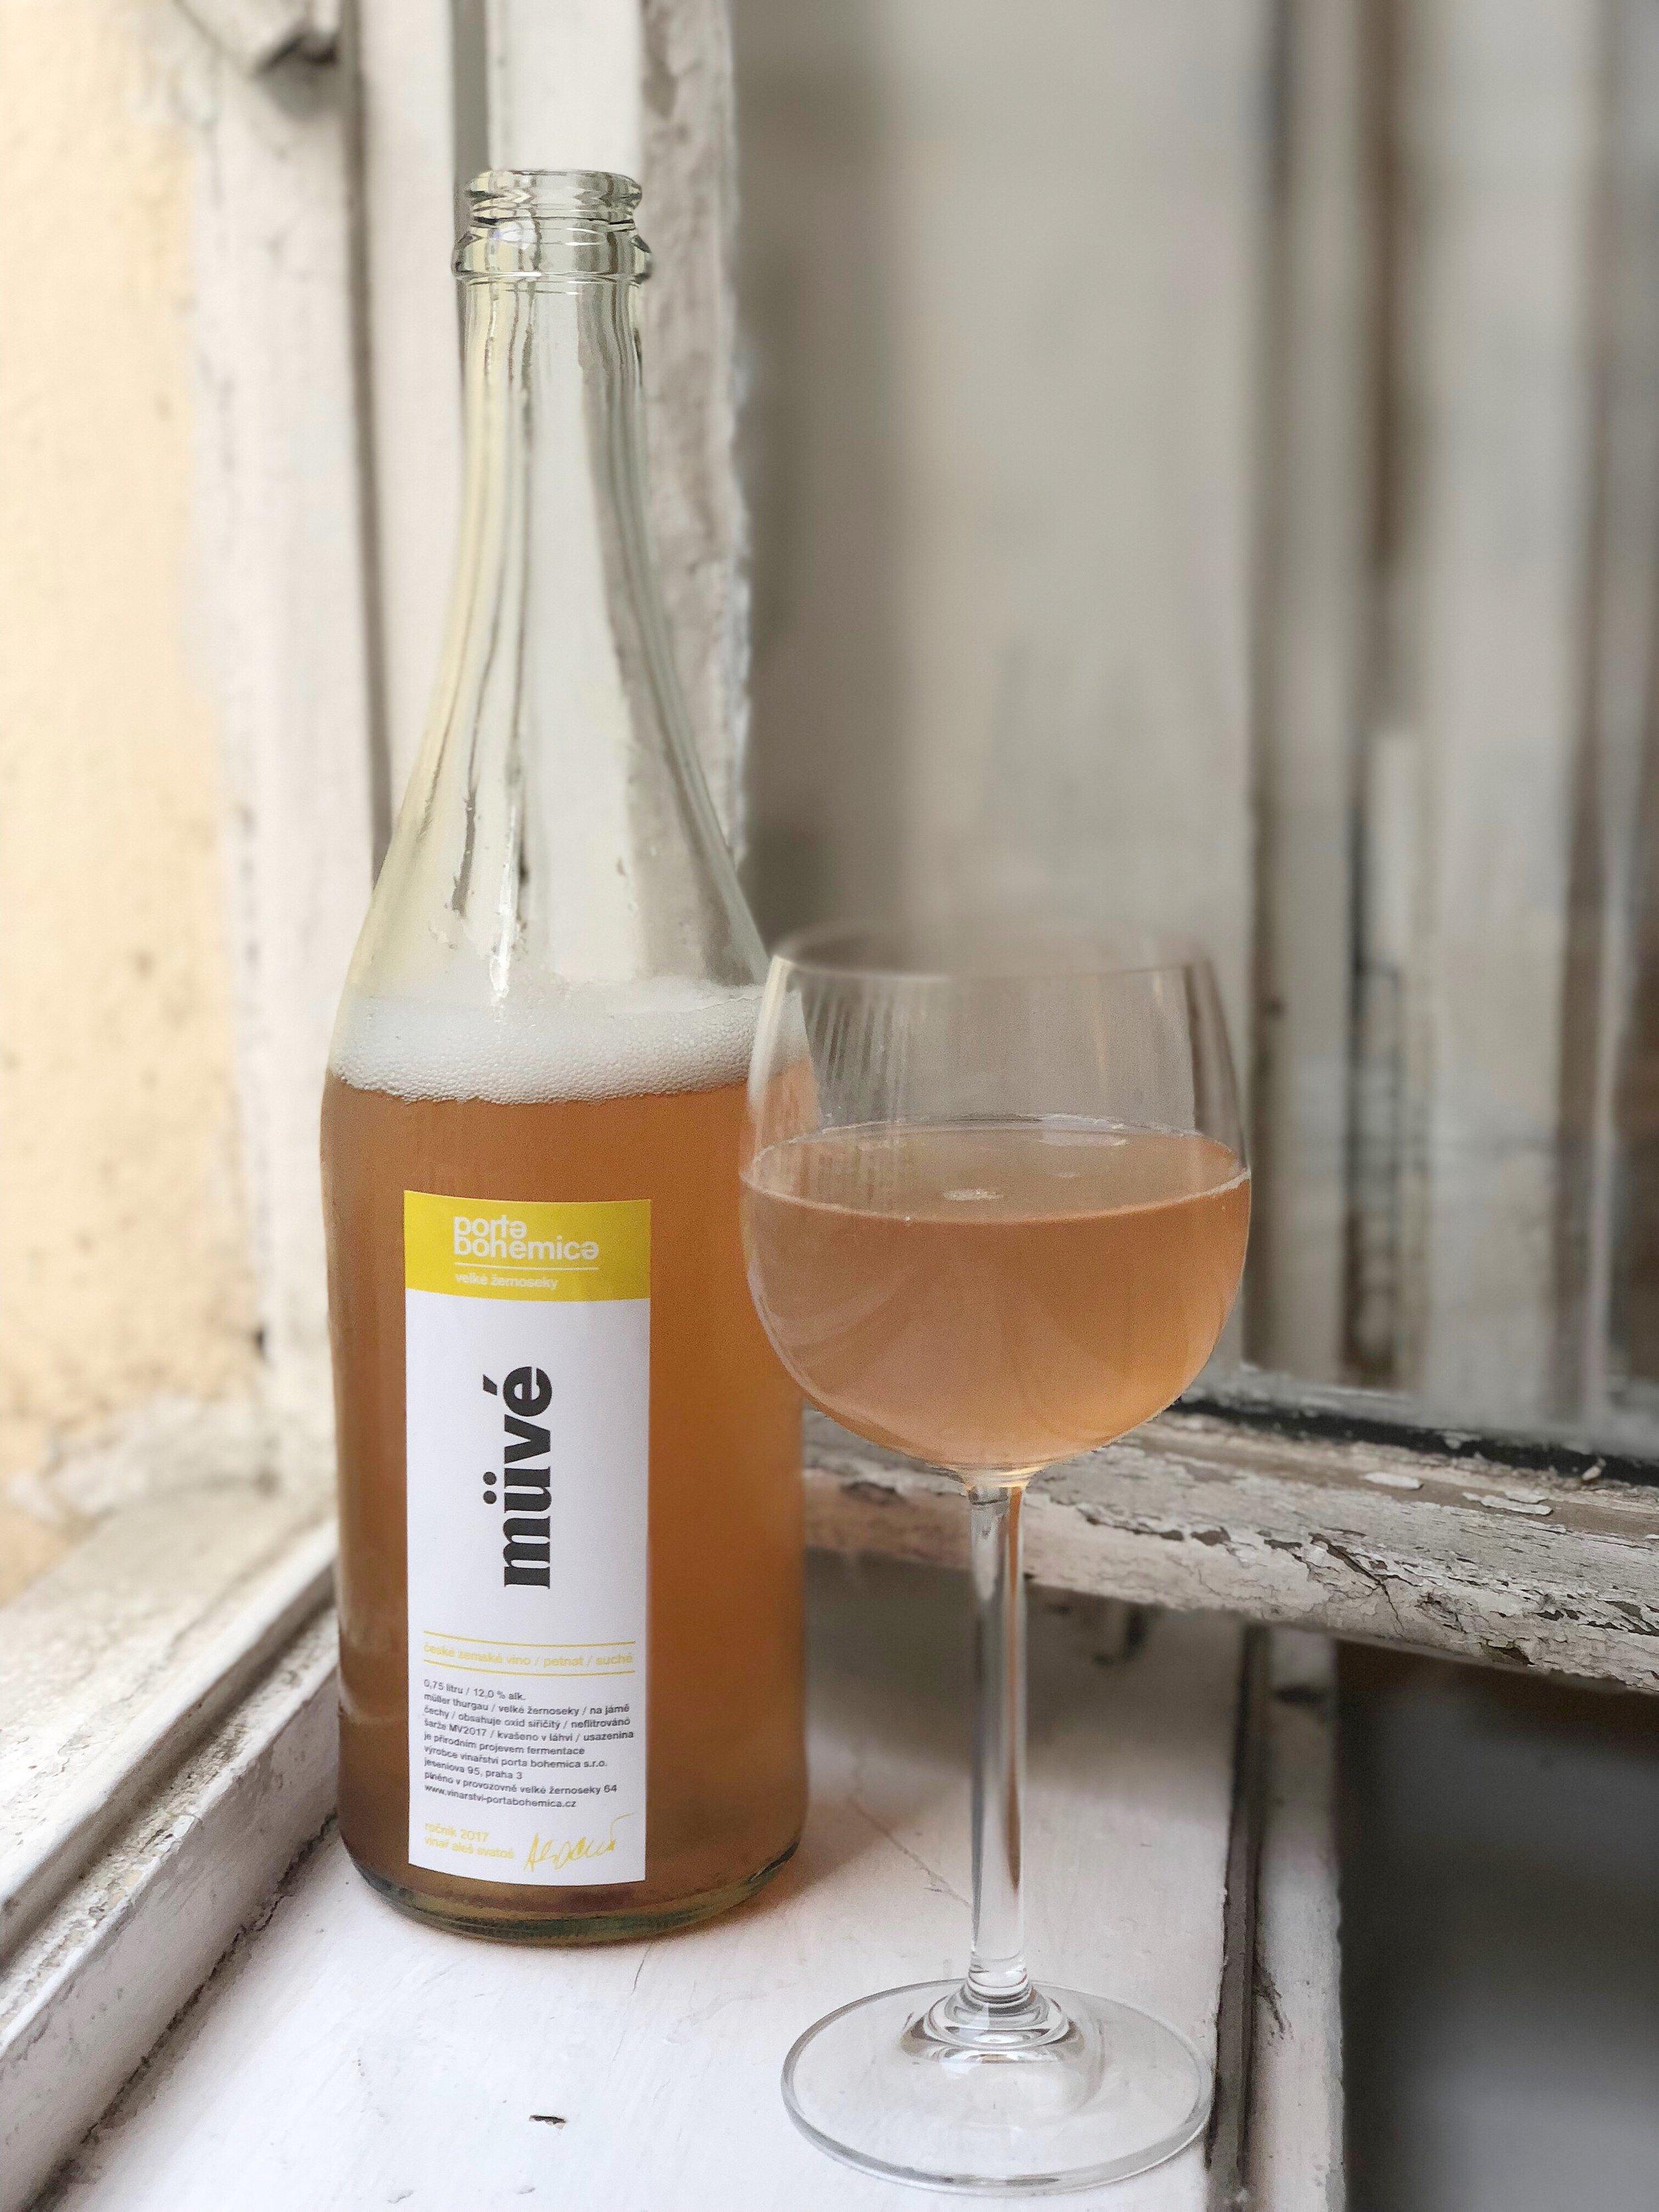 The delicious Müvé pét-nat from Porta Bohemica and winemaker Aleš Svatoš, available at Fajnšmekr.